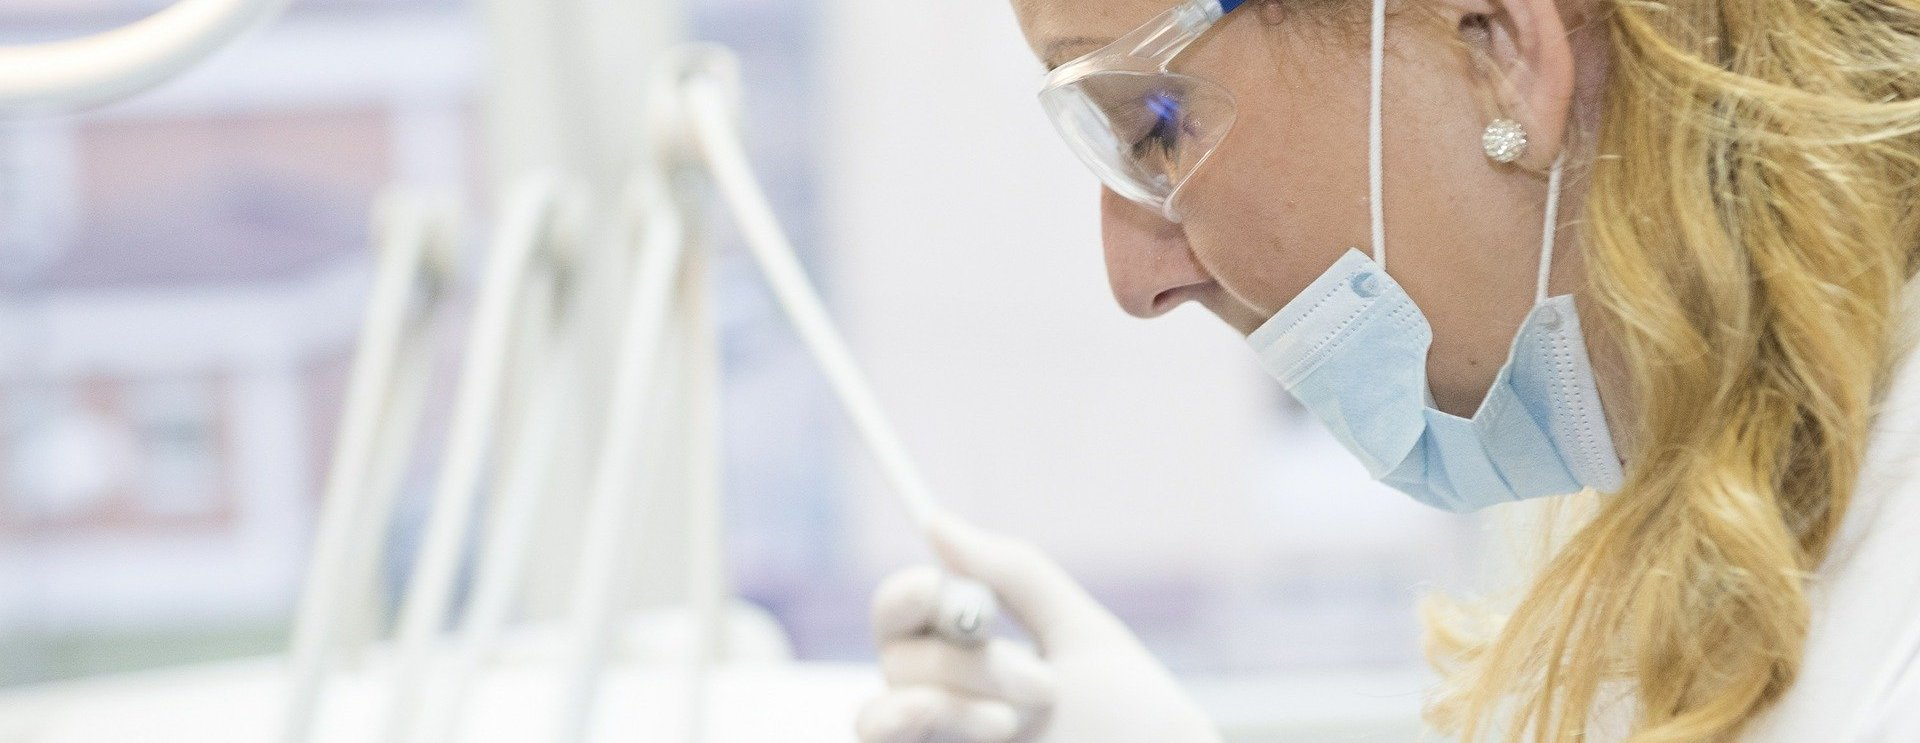 HARZ Labs помогает волонтерам и медикам в период пандемии коронавируса